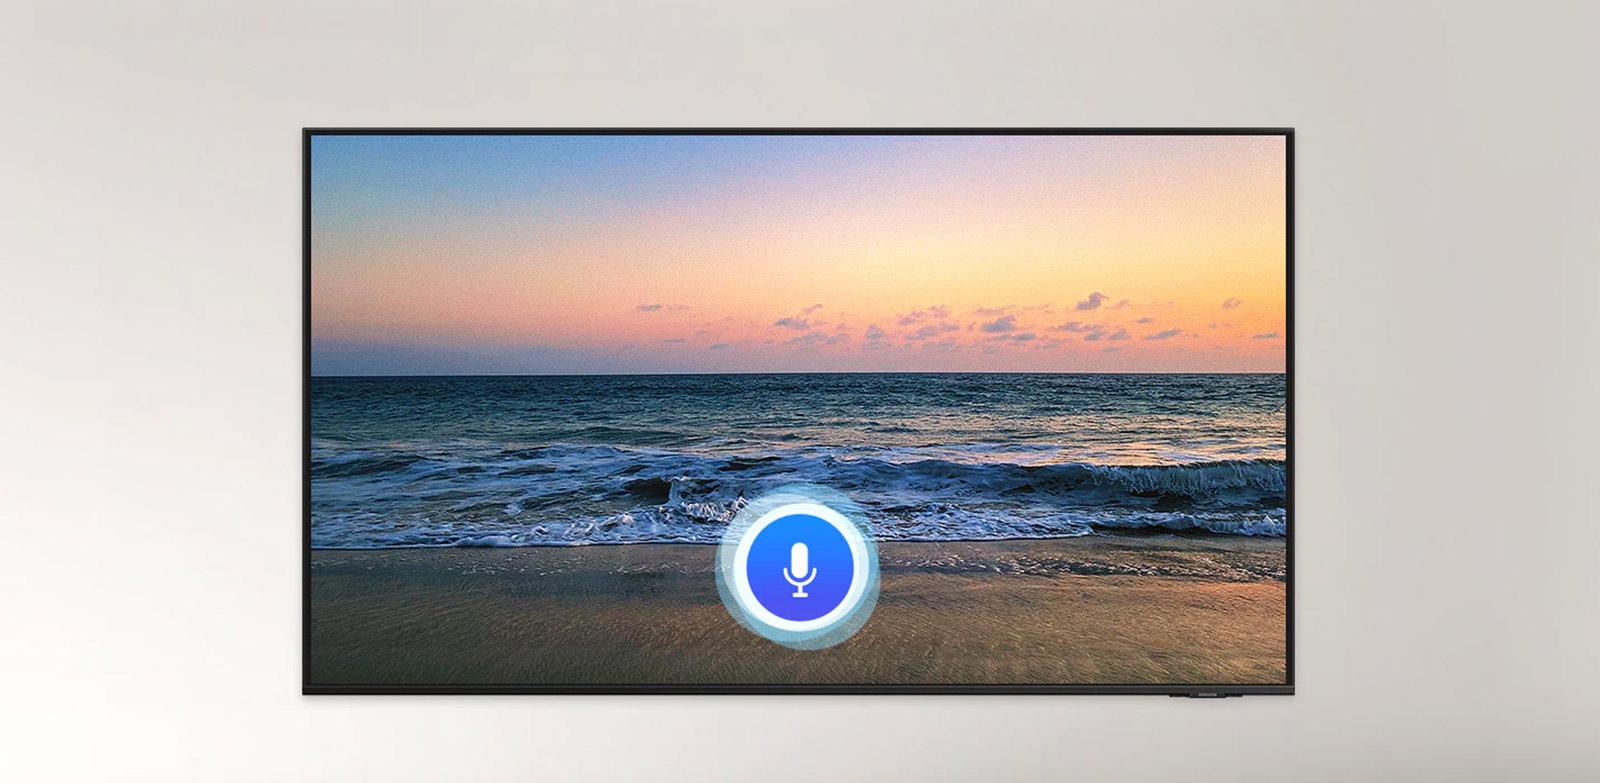 SAMSUNG - 60 Inch AU8000 Crystal UHD 4K Smart TV 2021 - UA60AU8000KXXA